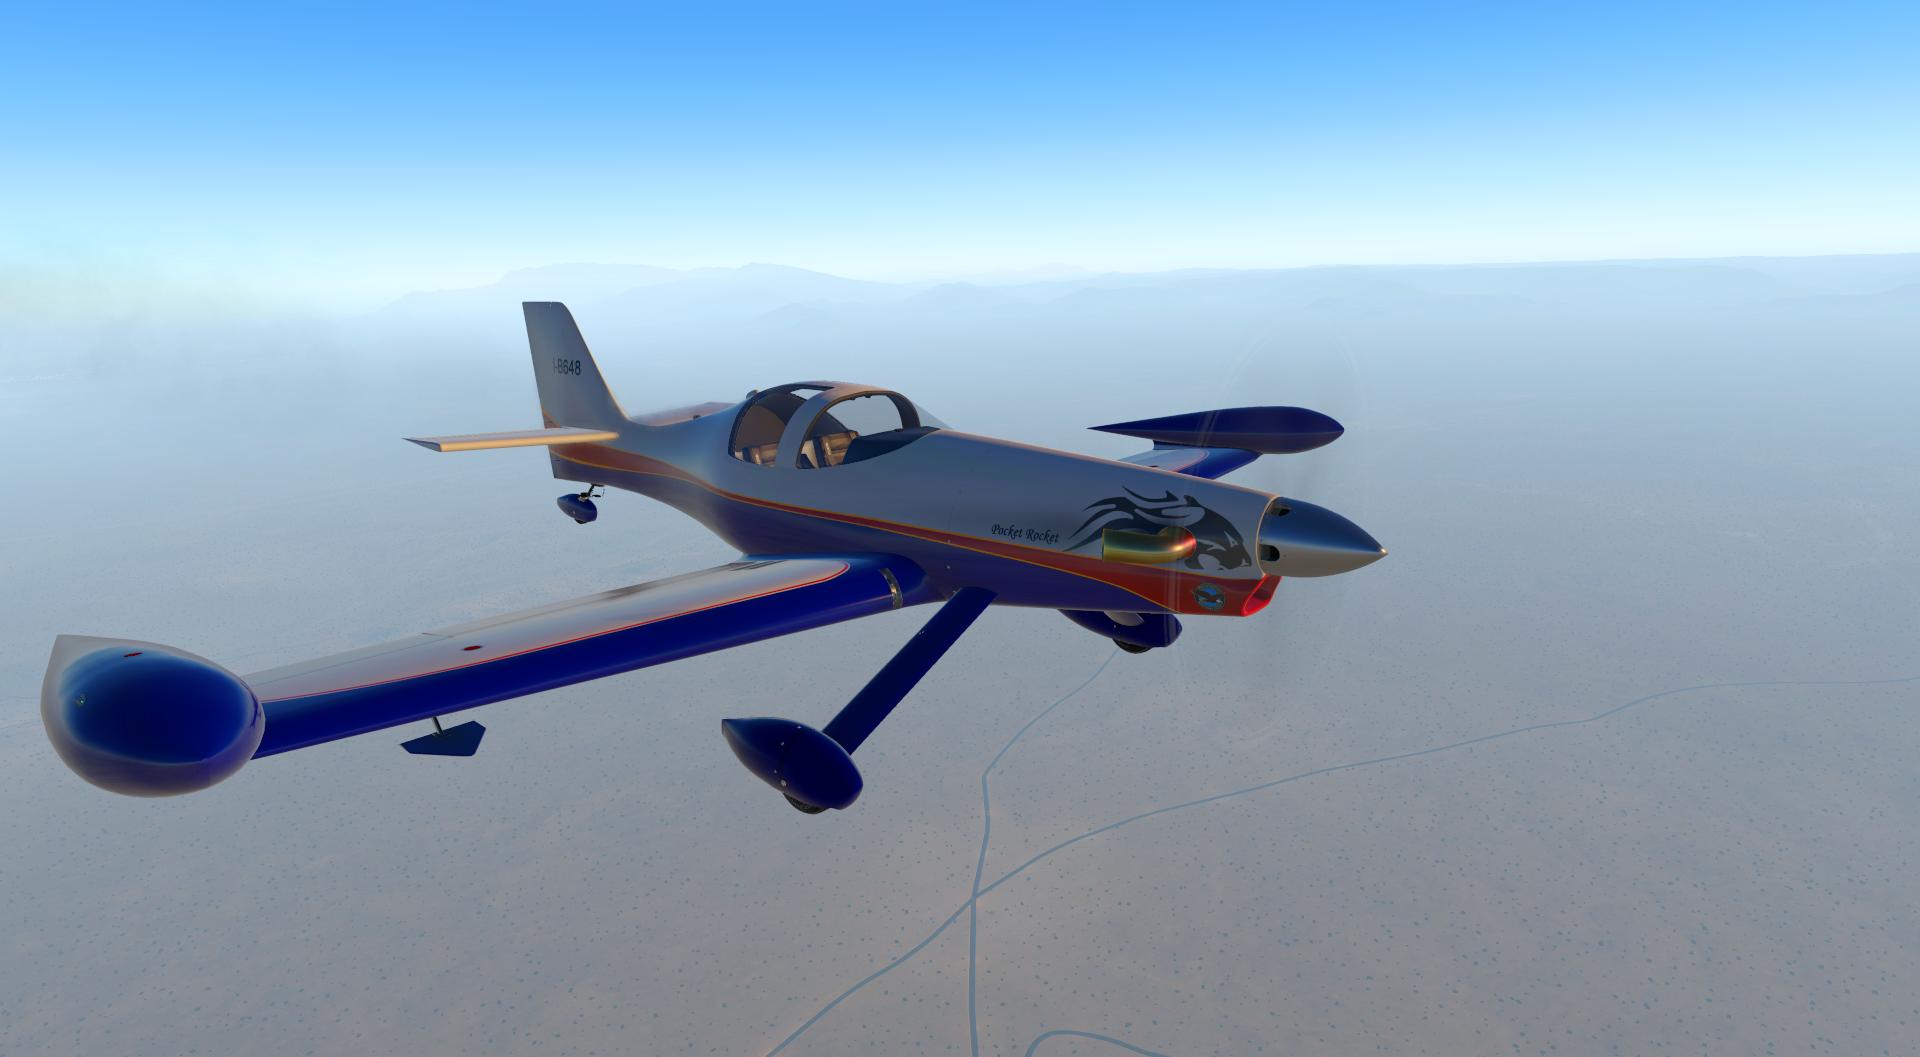 AFM Simulation